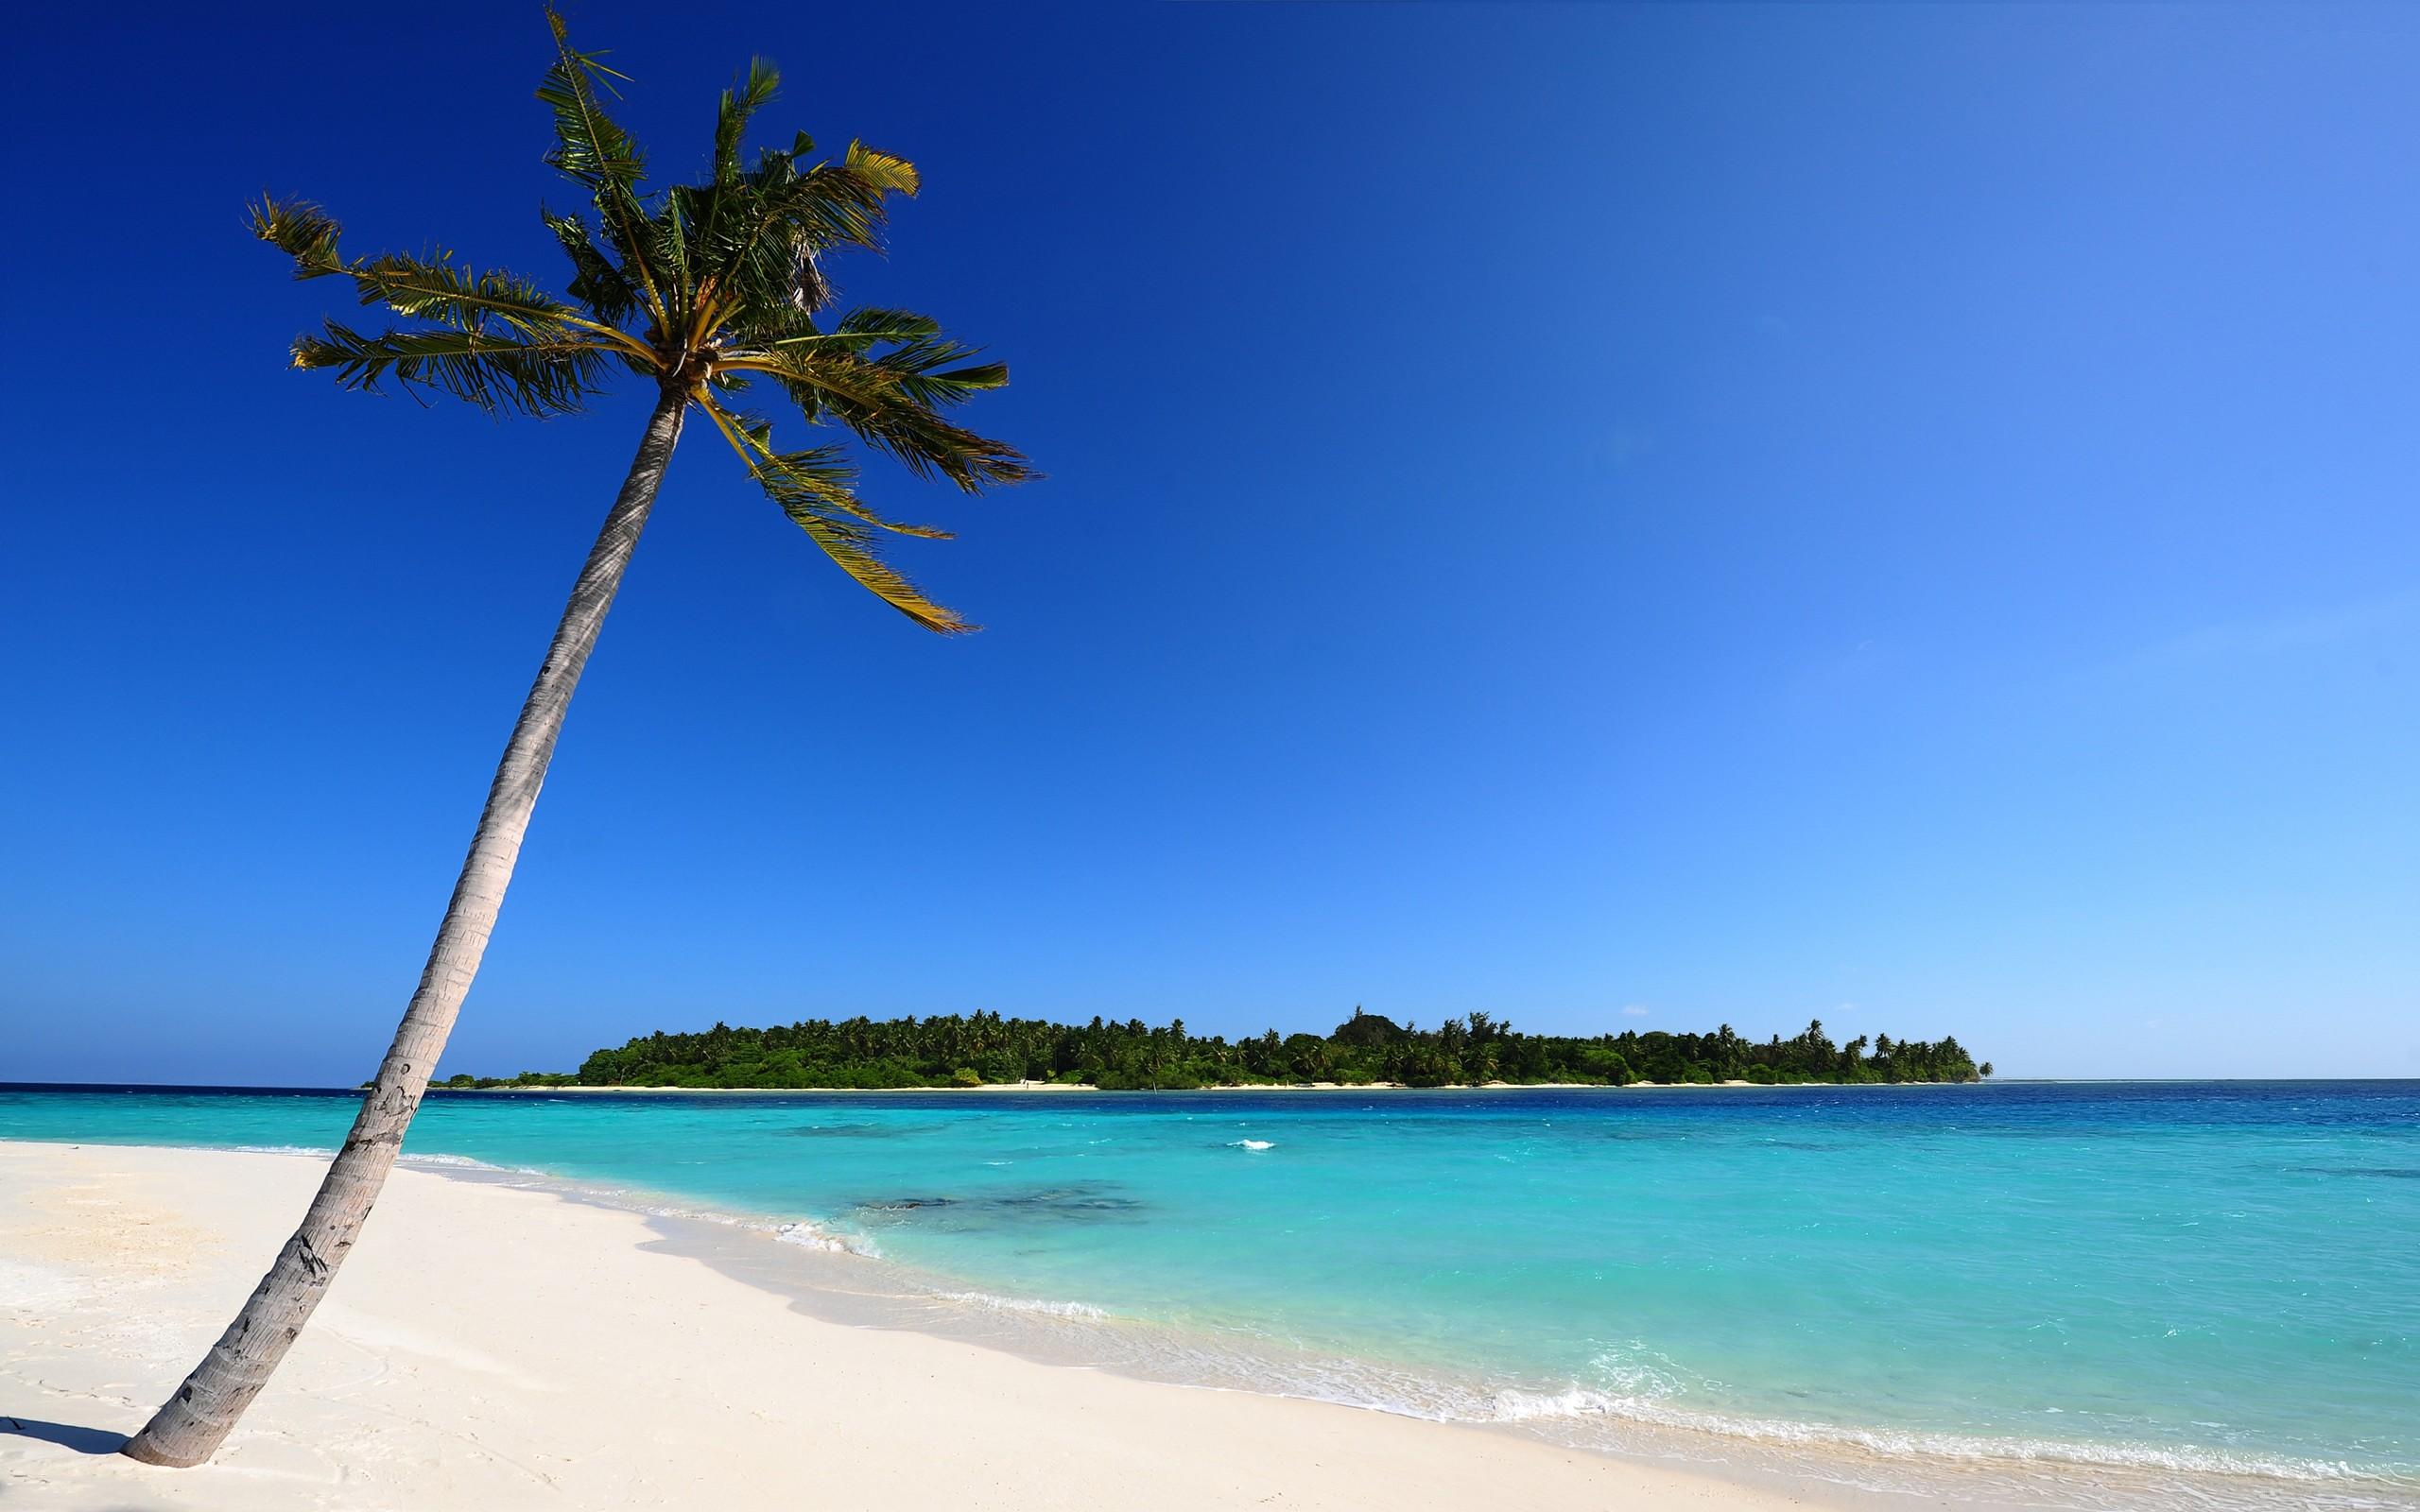 Hd Beach Desktop Backgrounds 61 Images